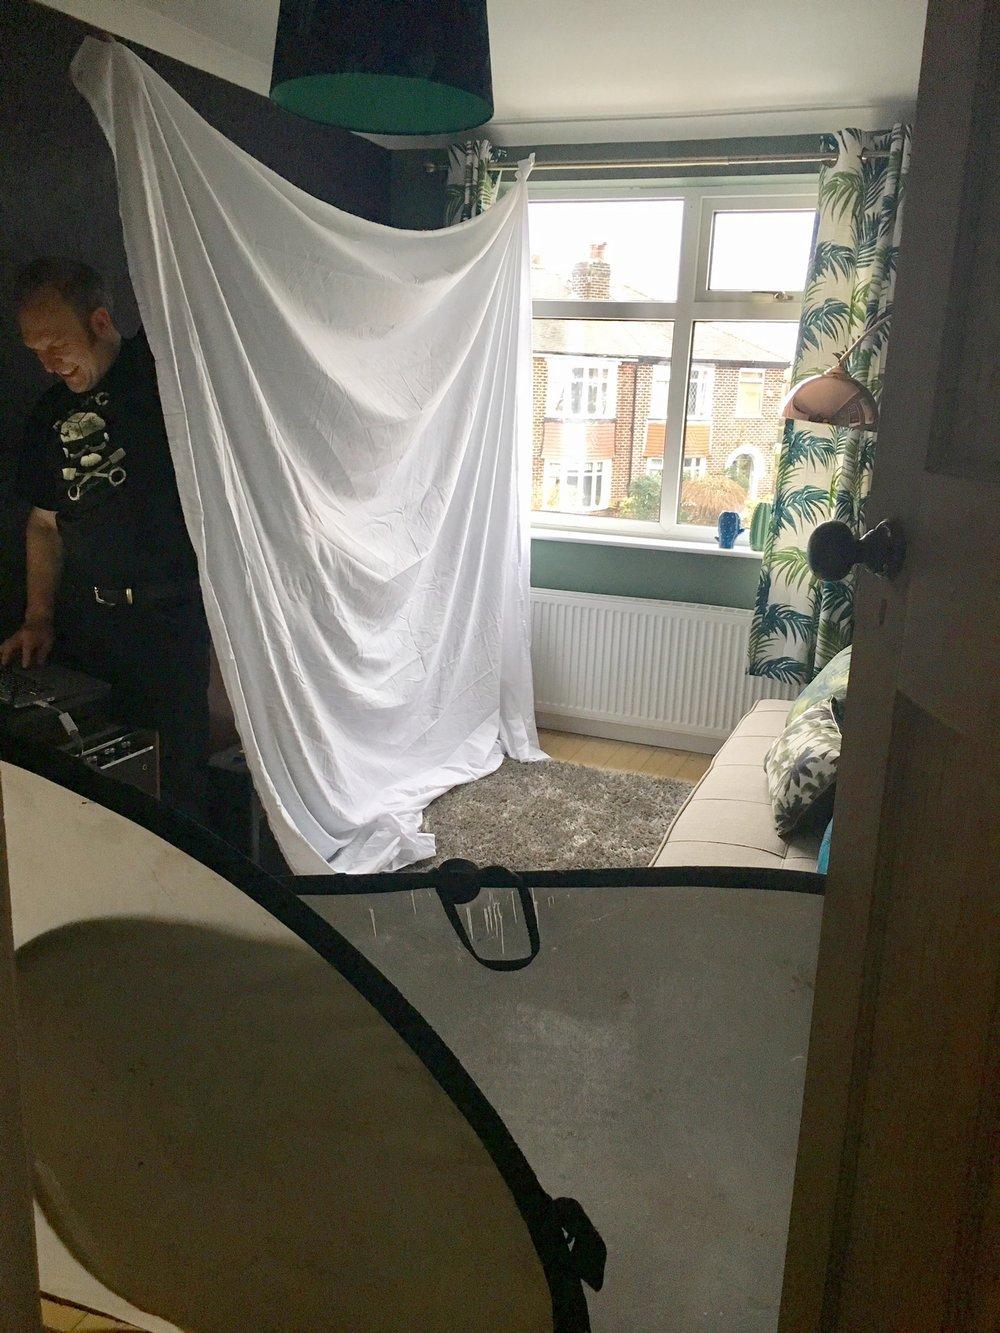 Interiors photoshoot behind the scenes